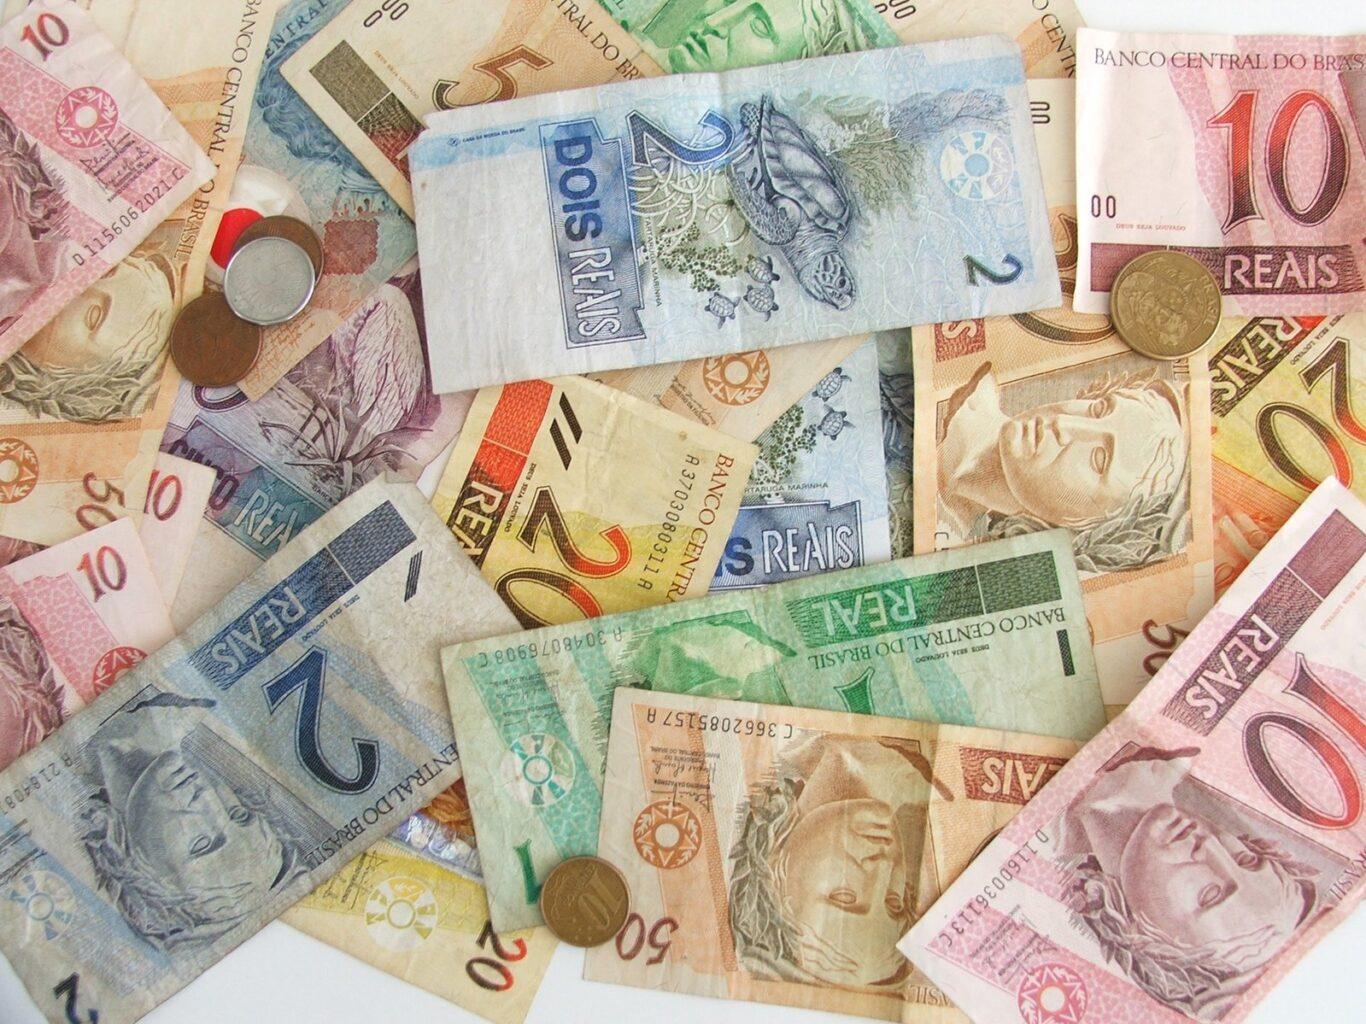 Dívida interna: entenda tudo sobre a dívida pública brasileira